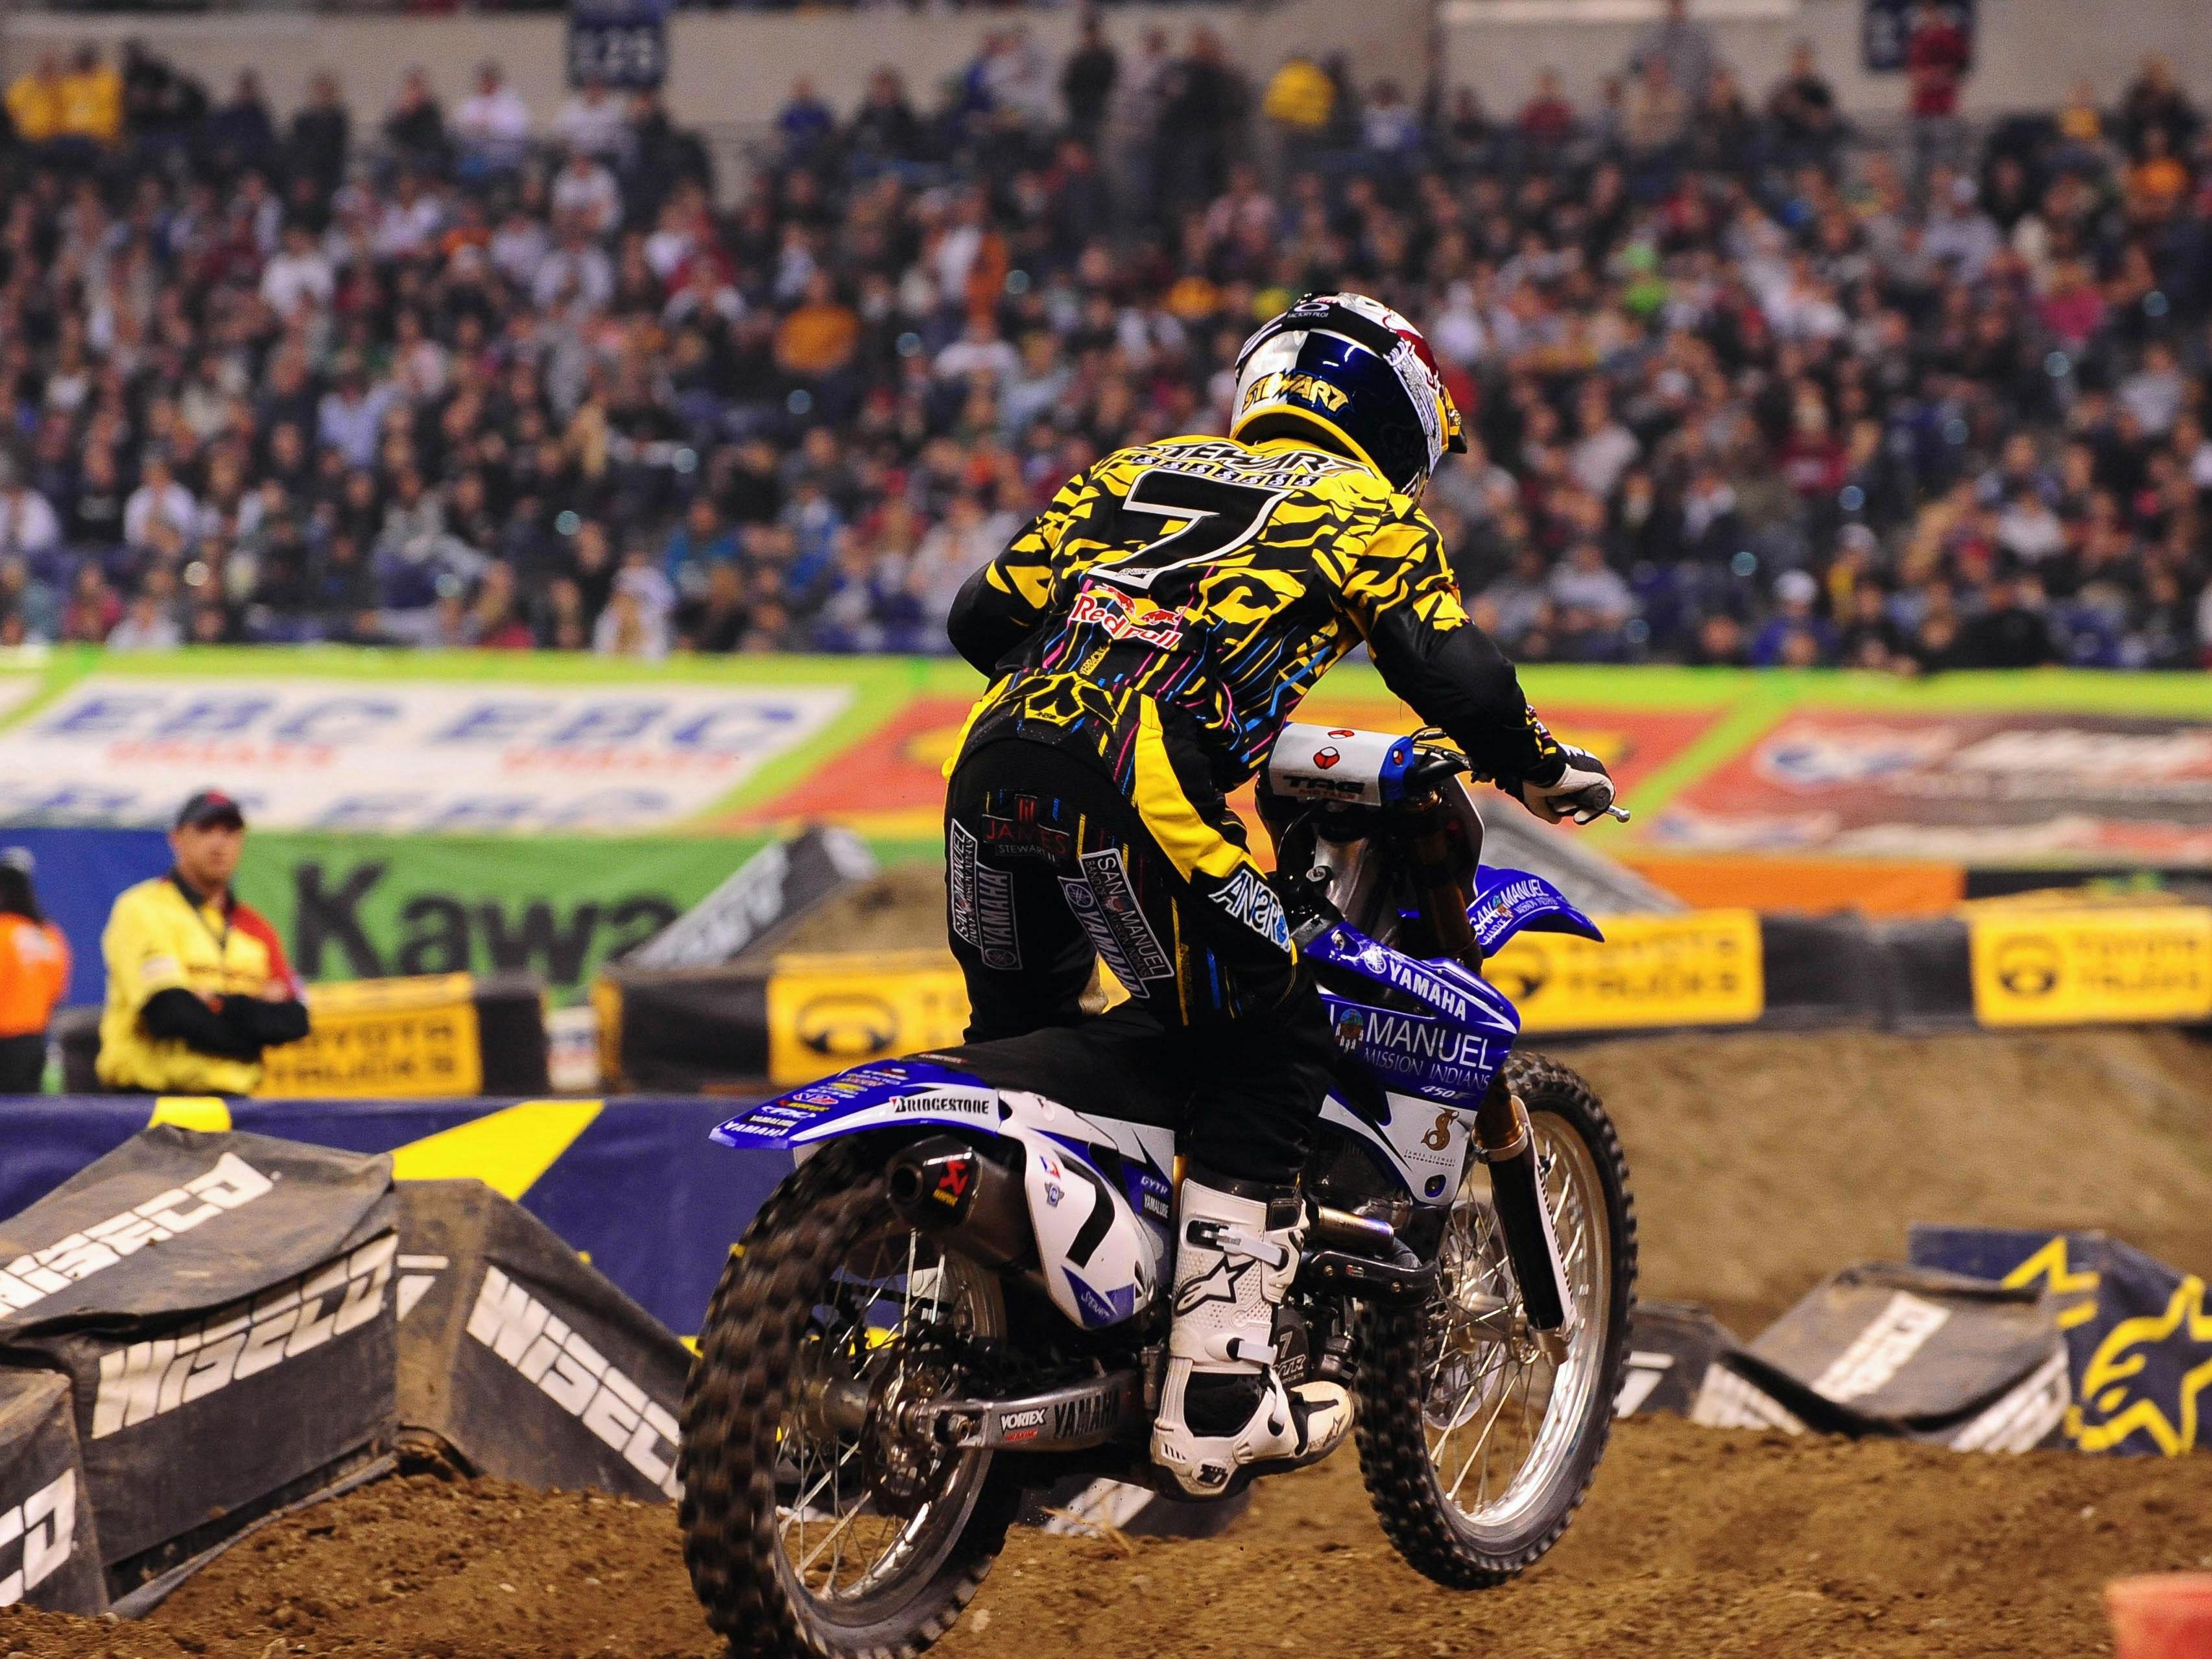 Chad Reed (Suzuki) rompe la racha de Stewart